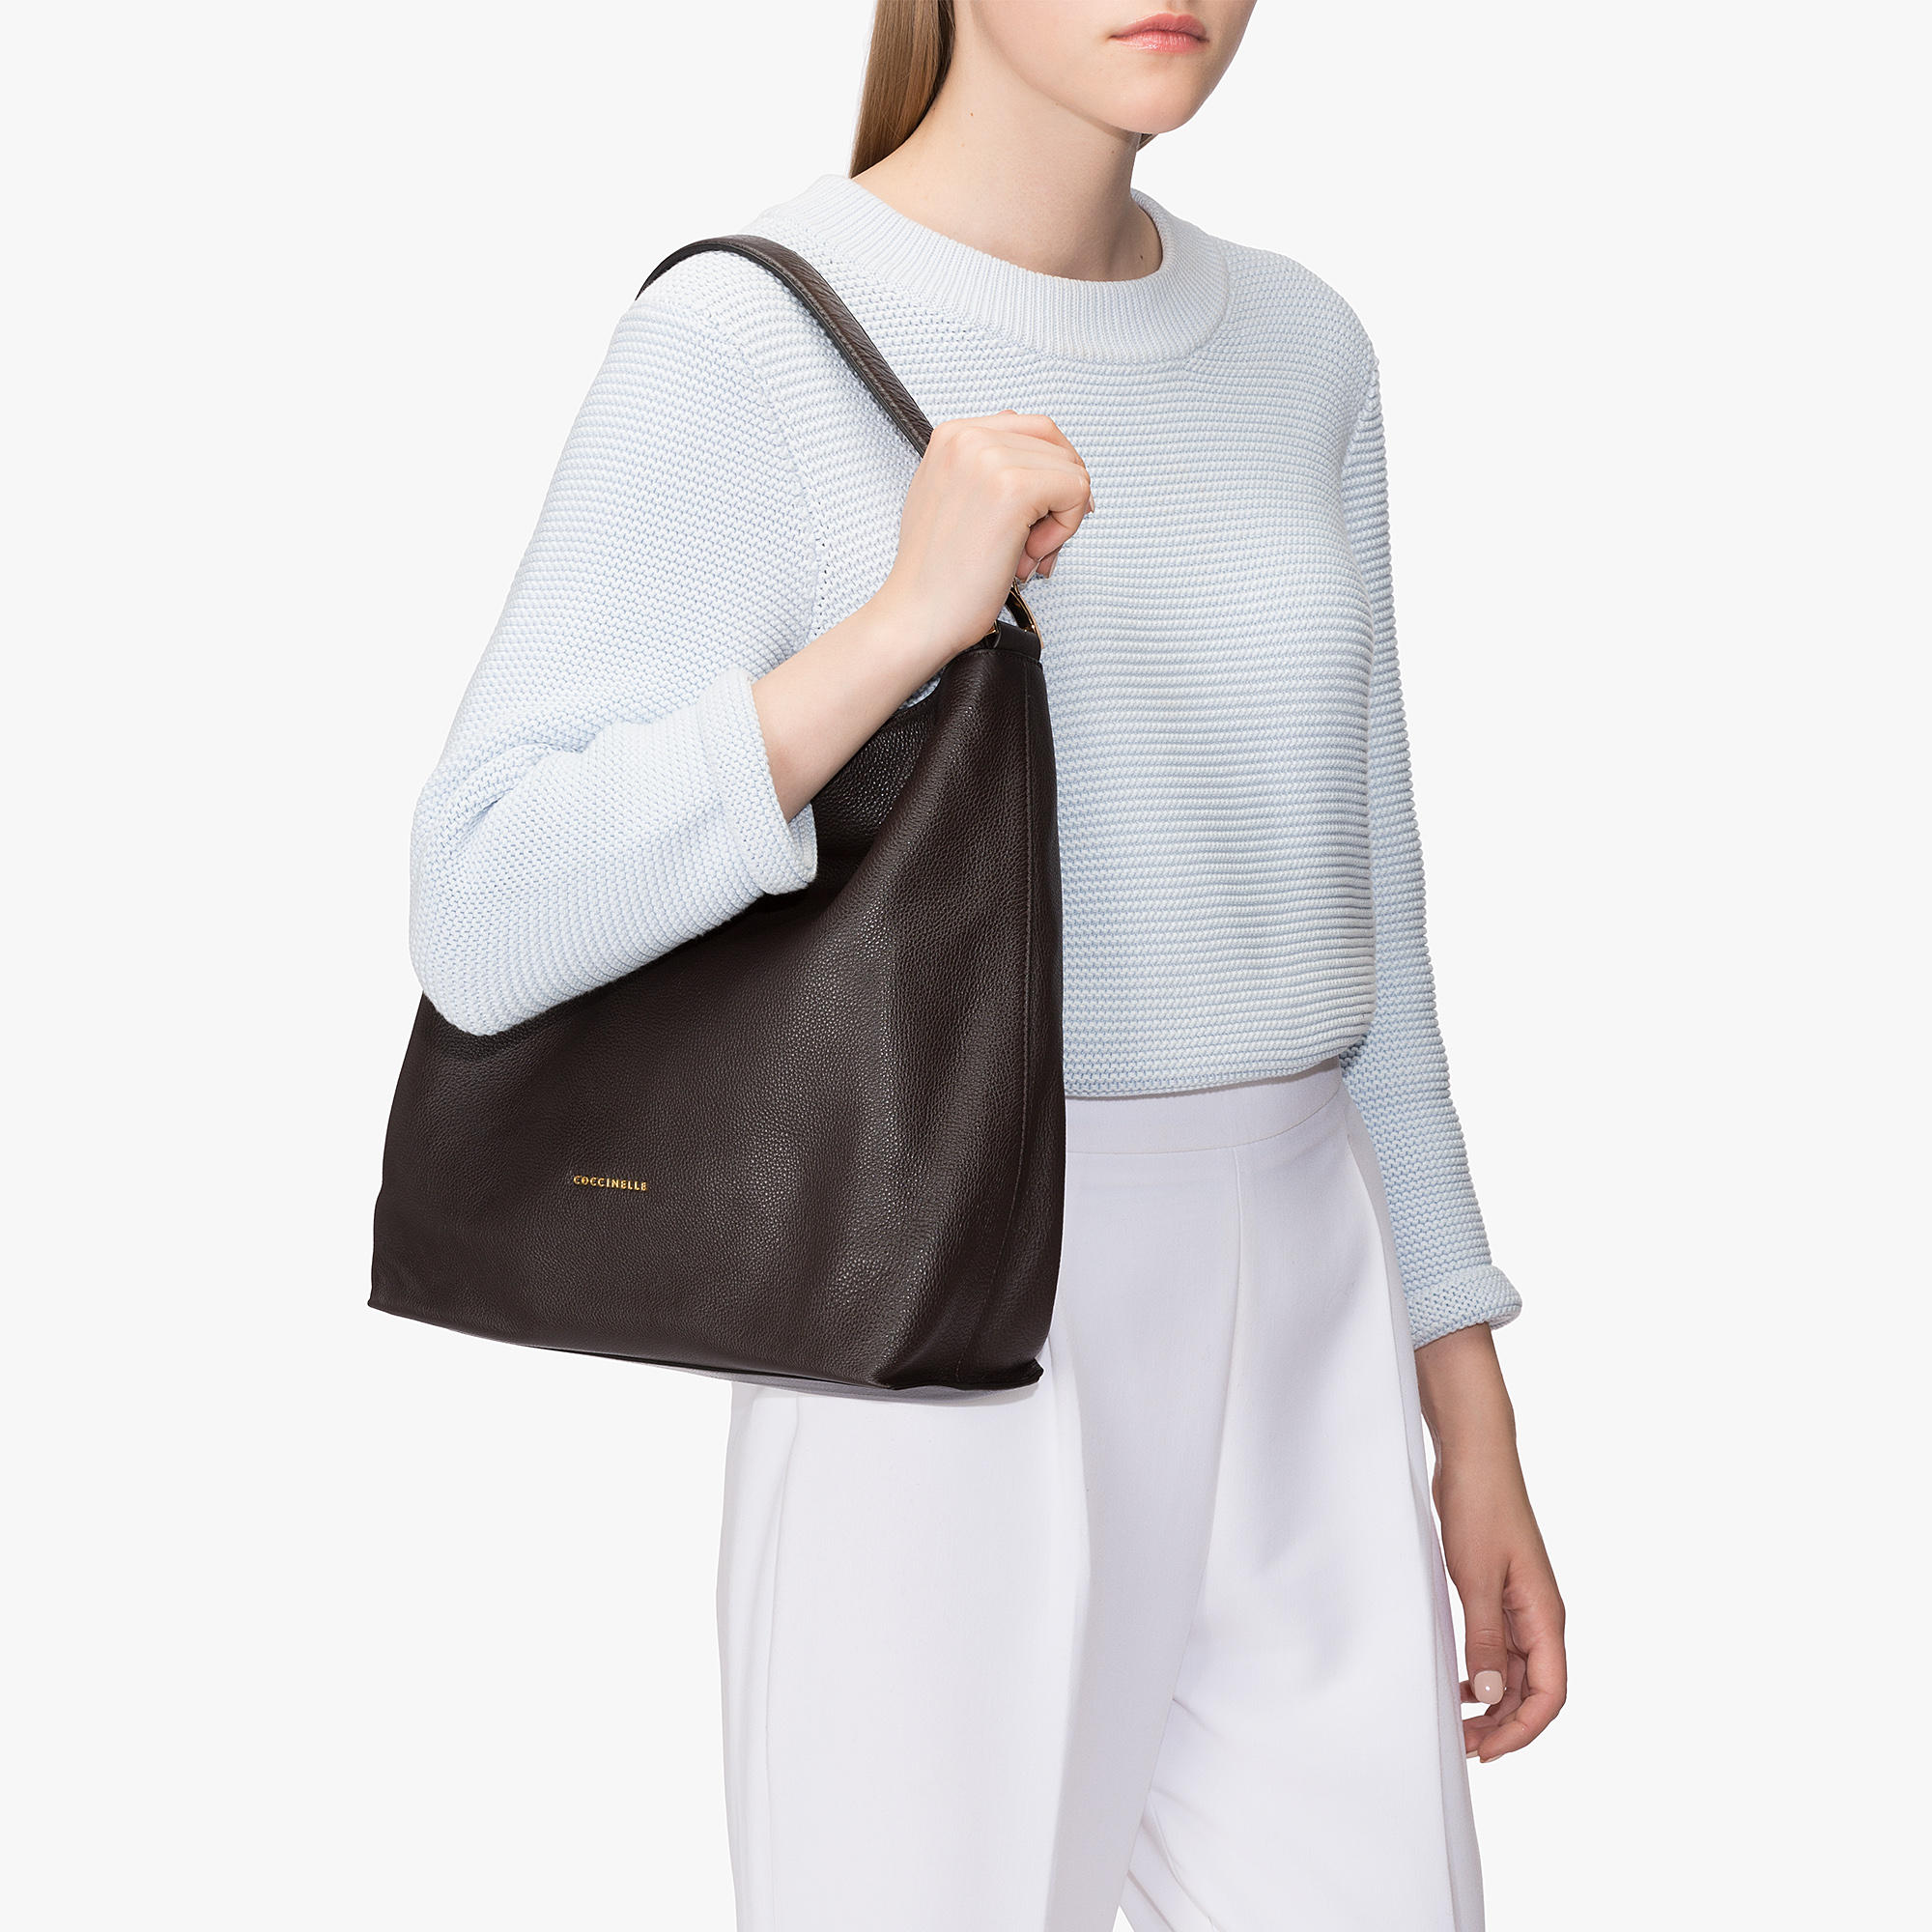 Coccinelle Arlettis leather hobo bag